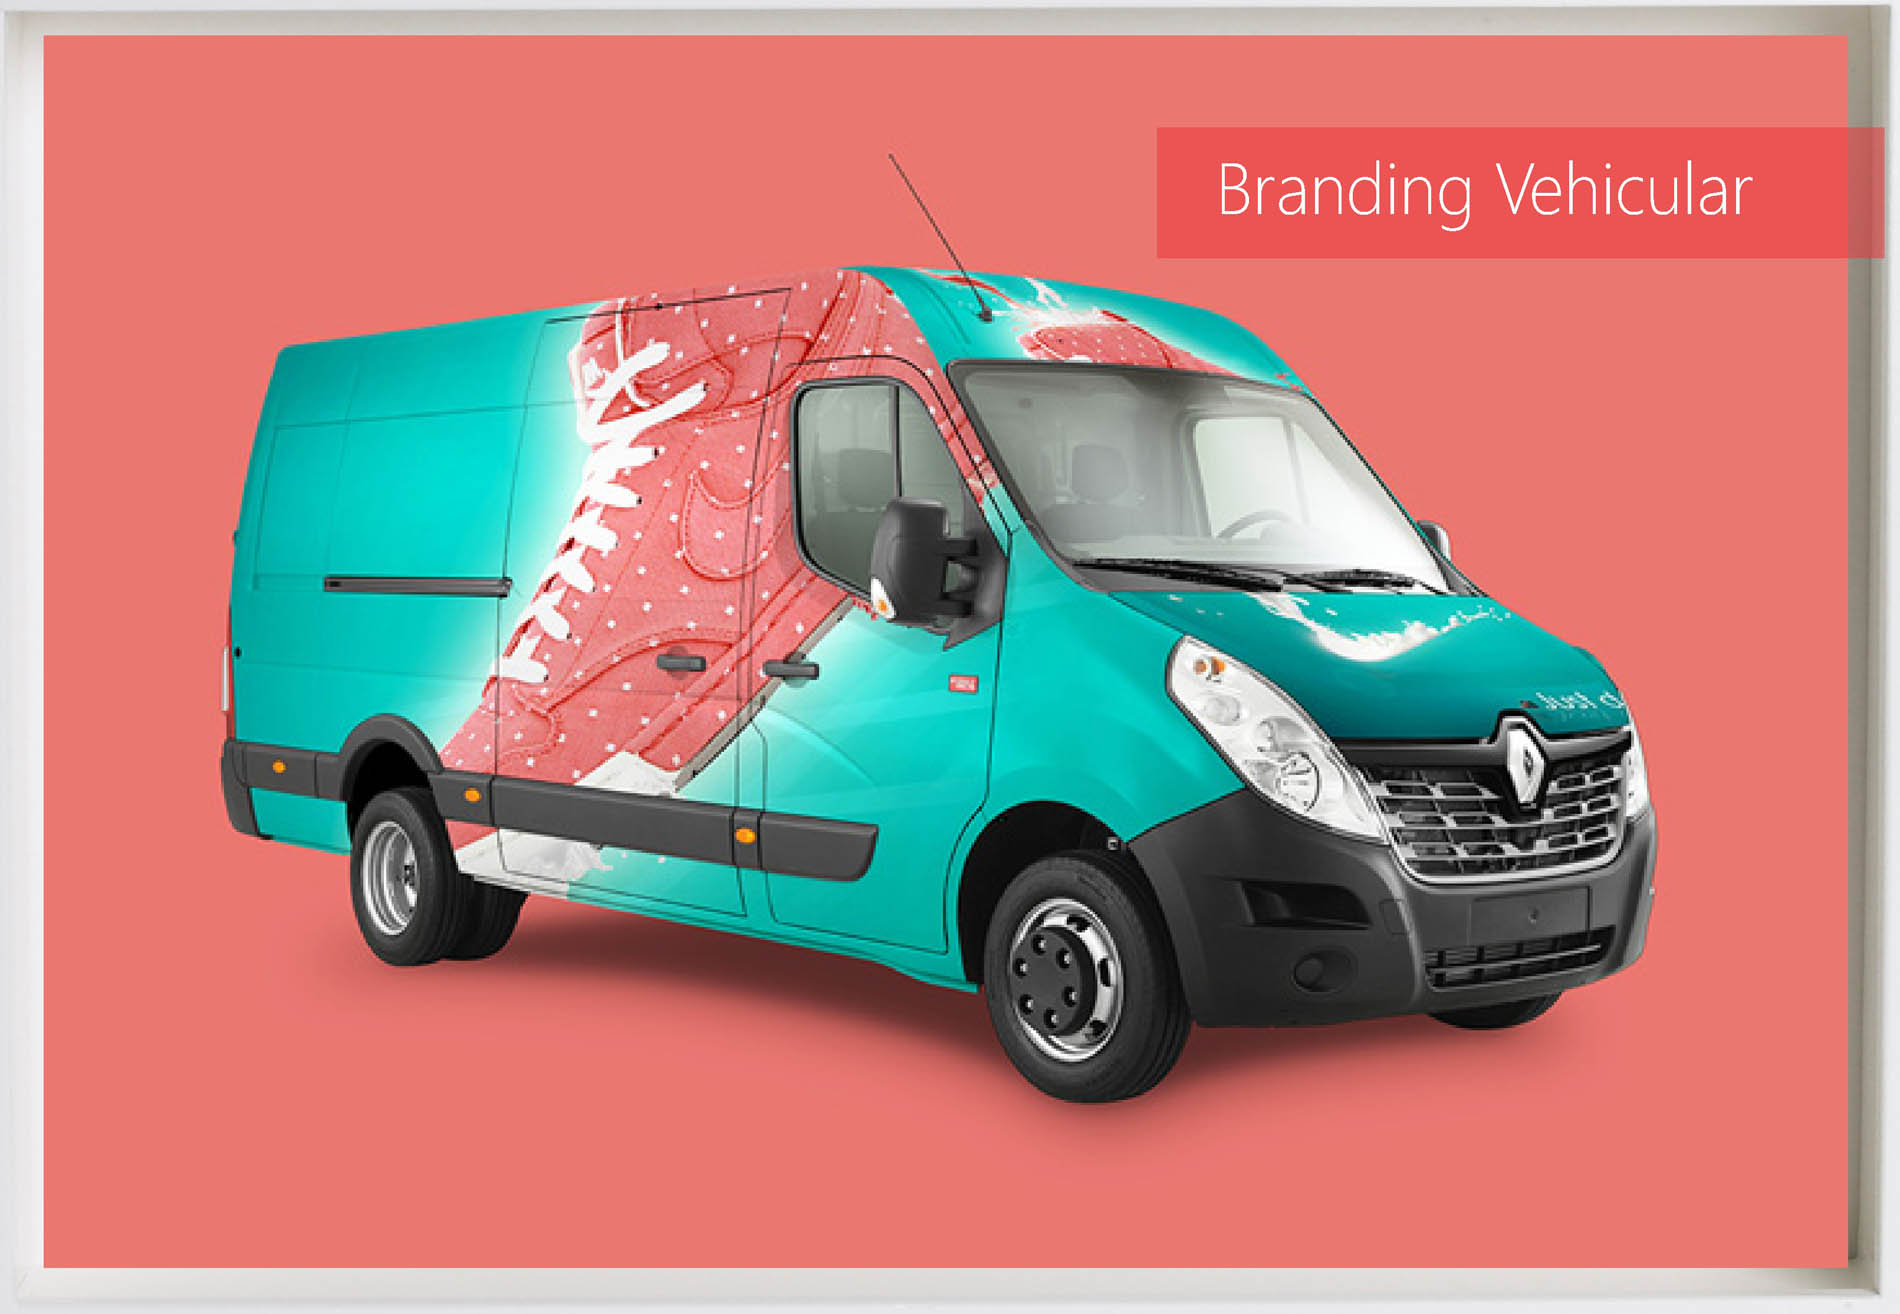 37_branding_vehicular_ggcm